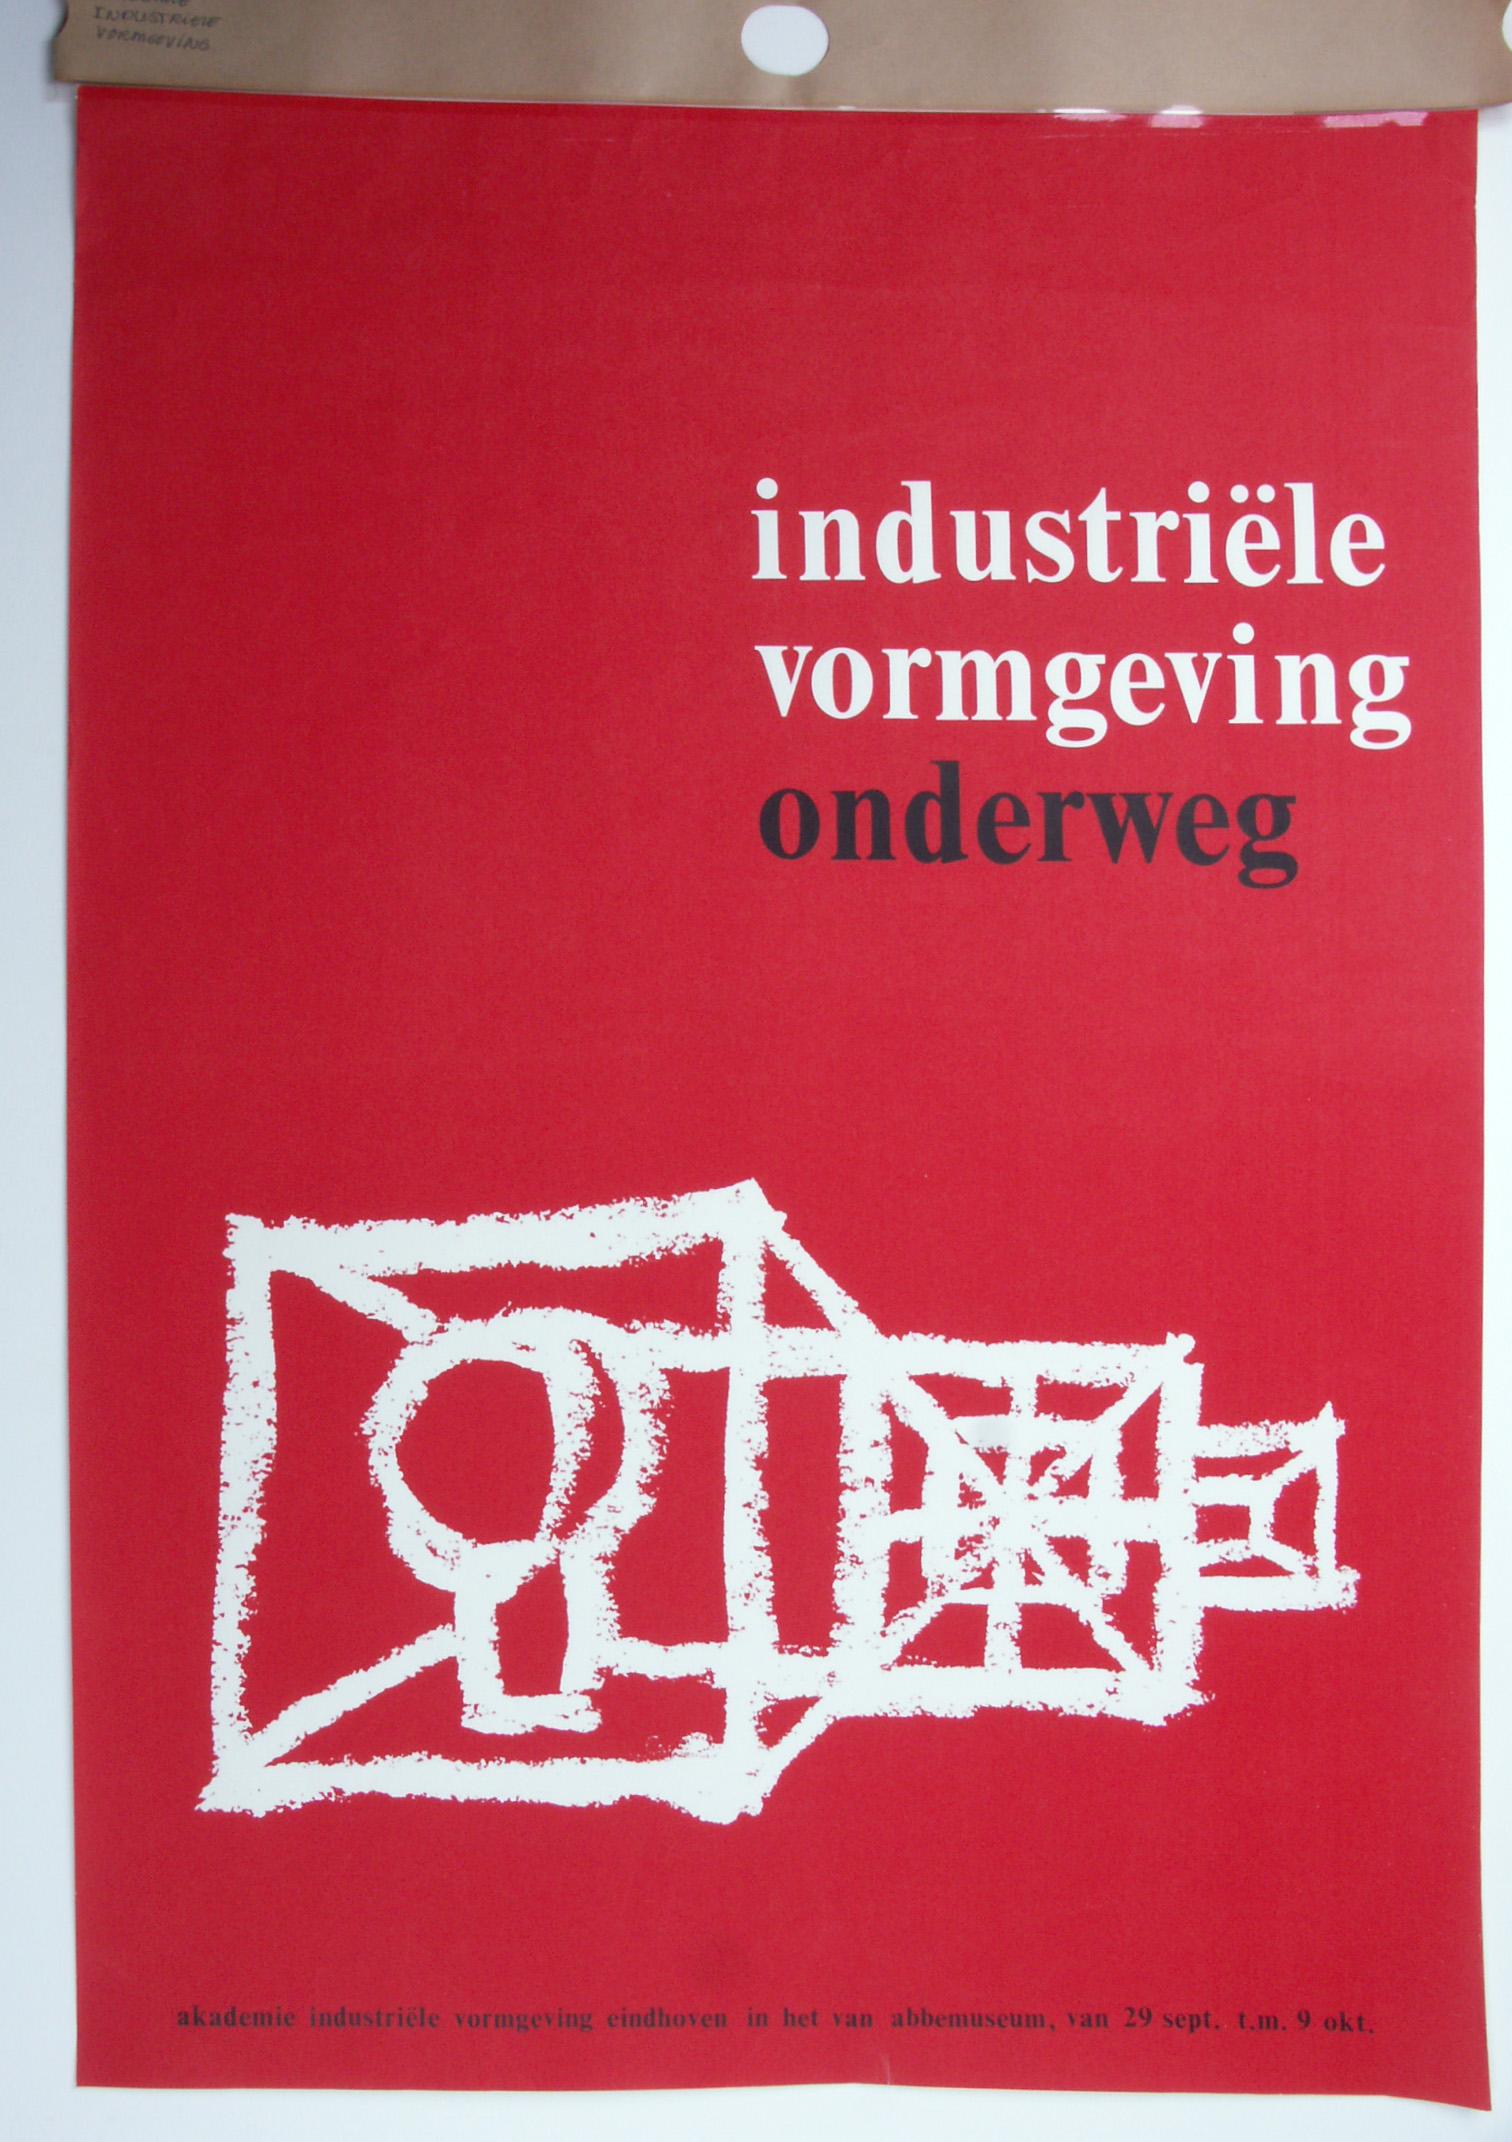 Industriële vormgeving onderweg